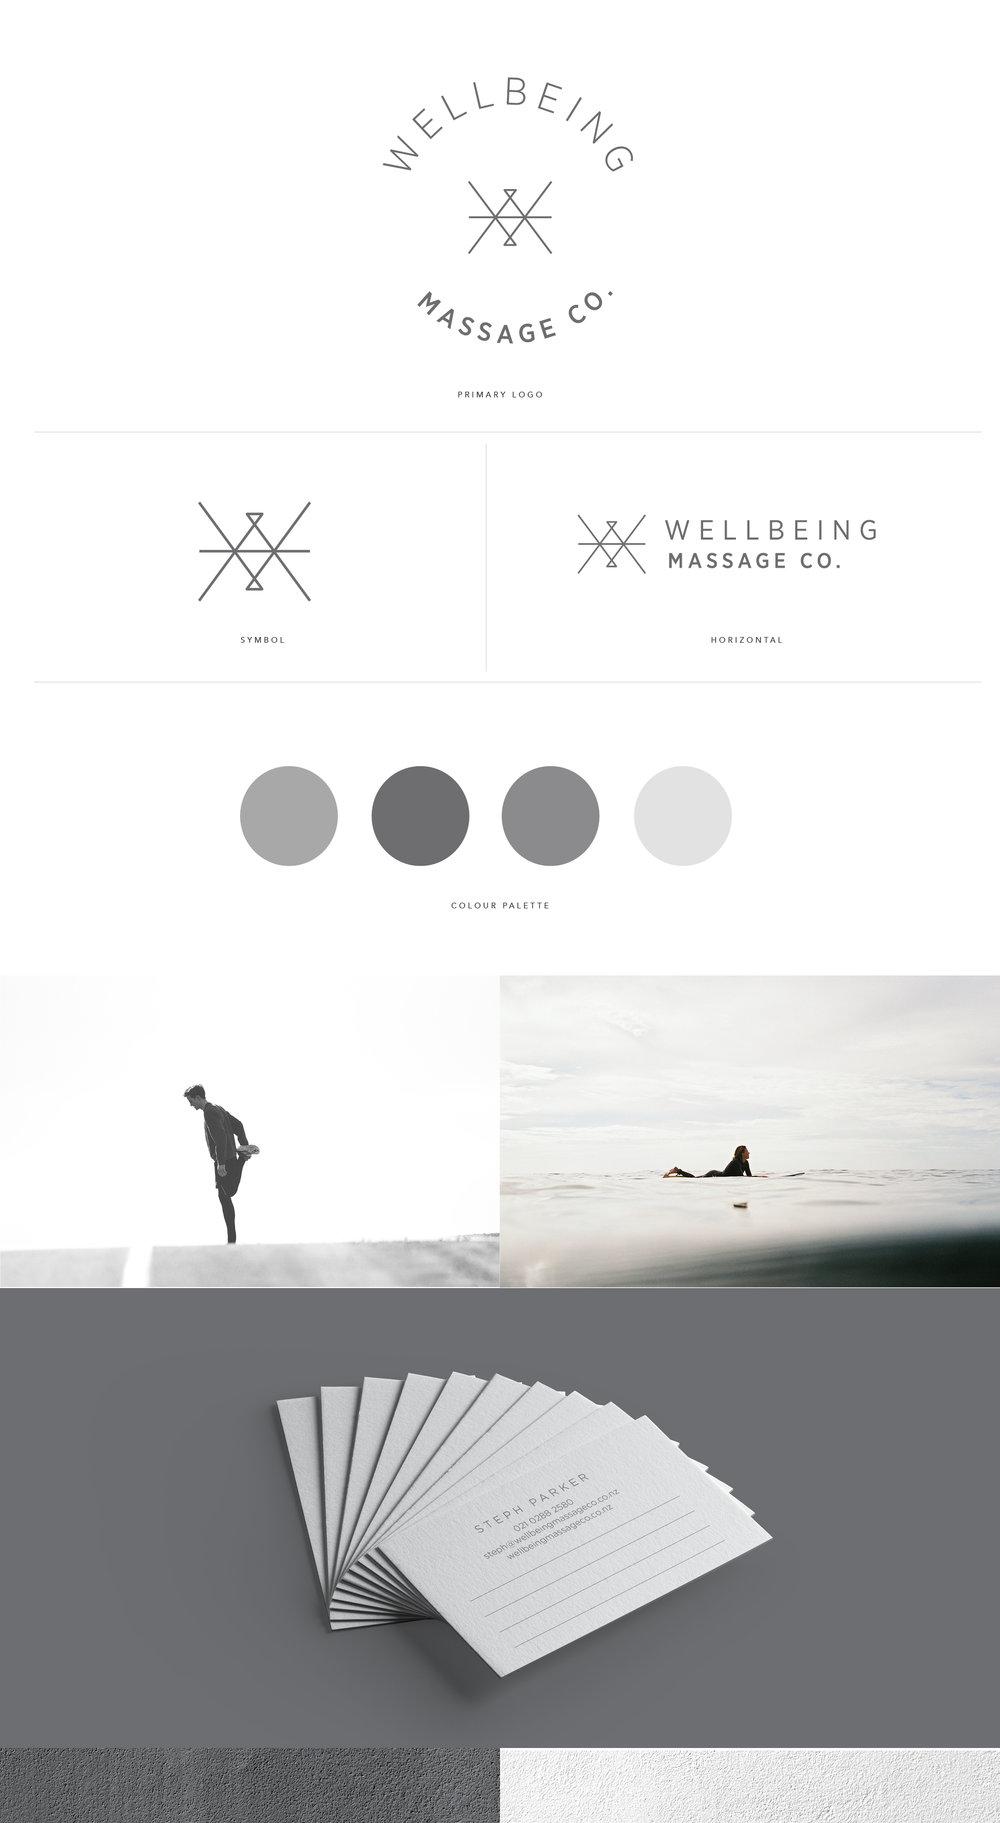 wellbeingmassageco-visual identity.jpg